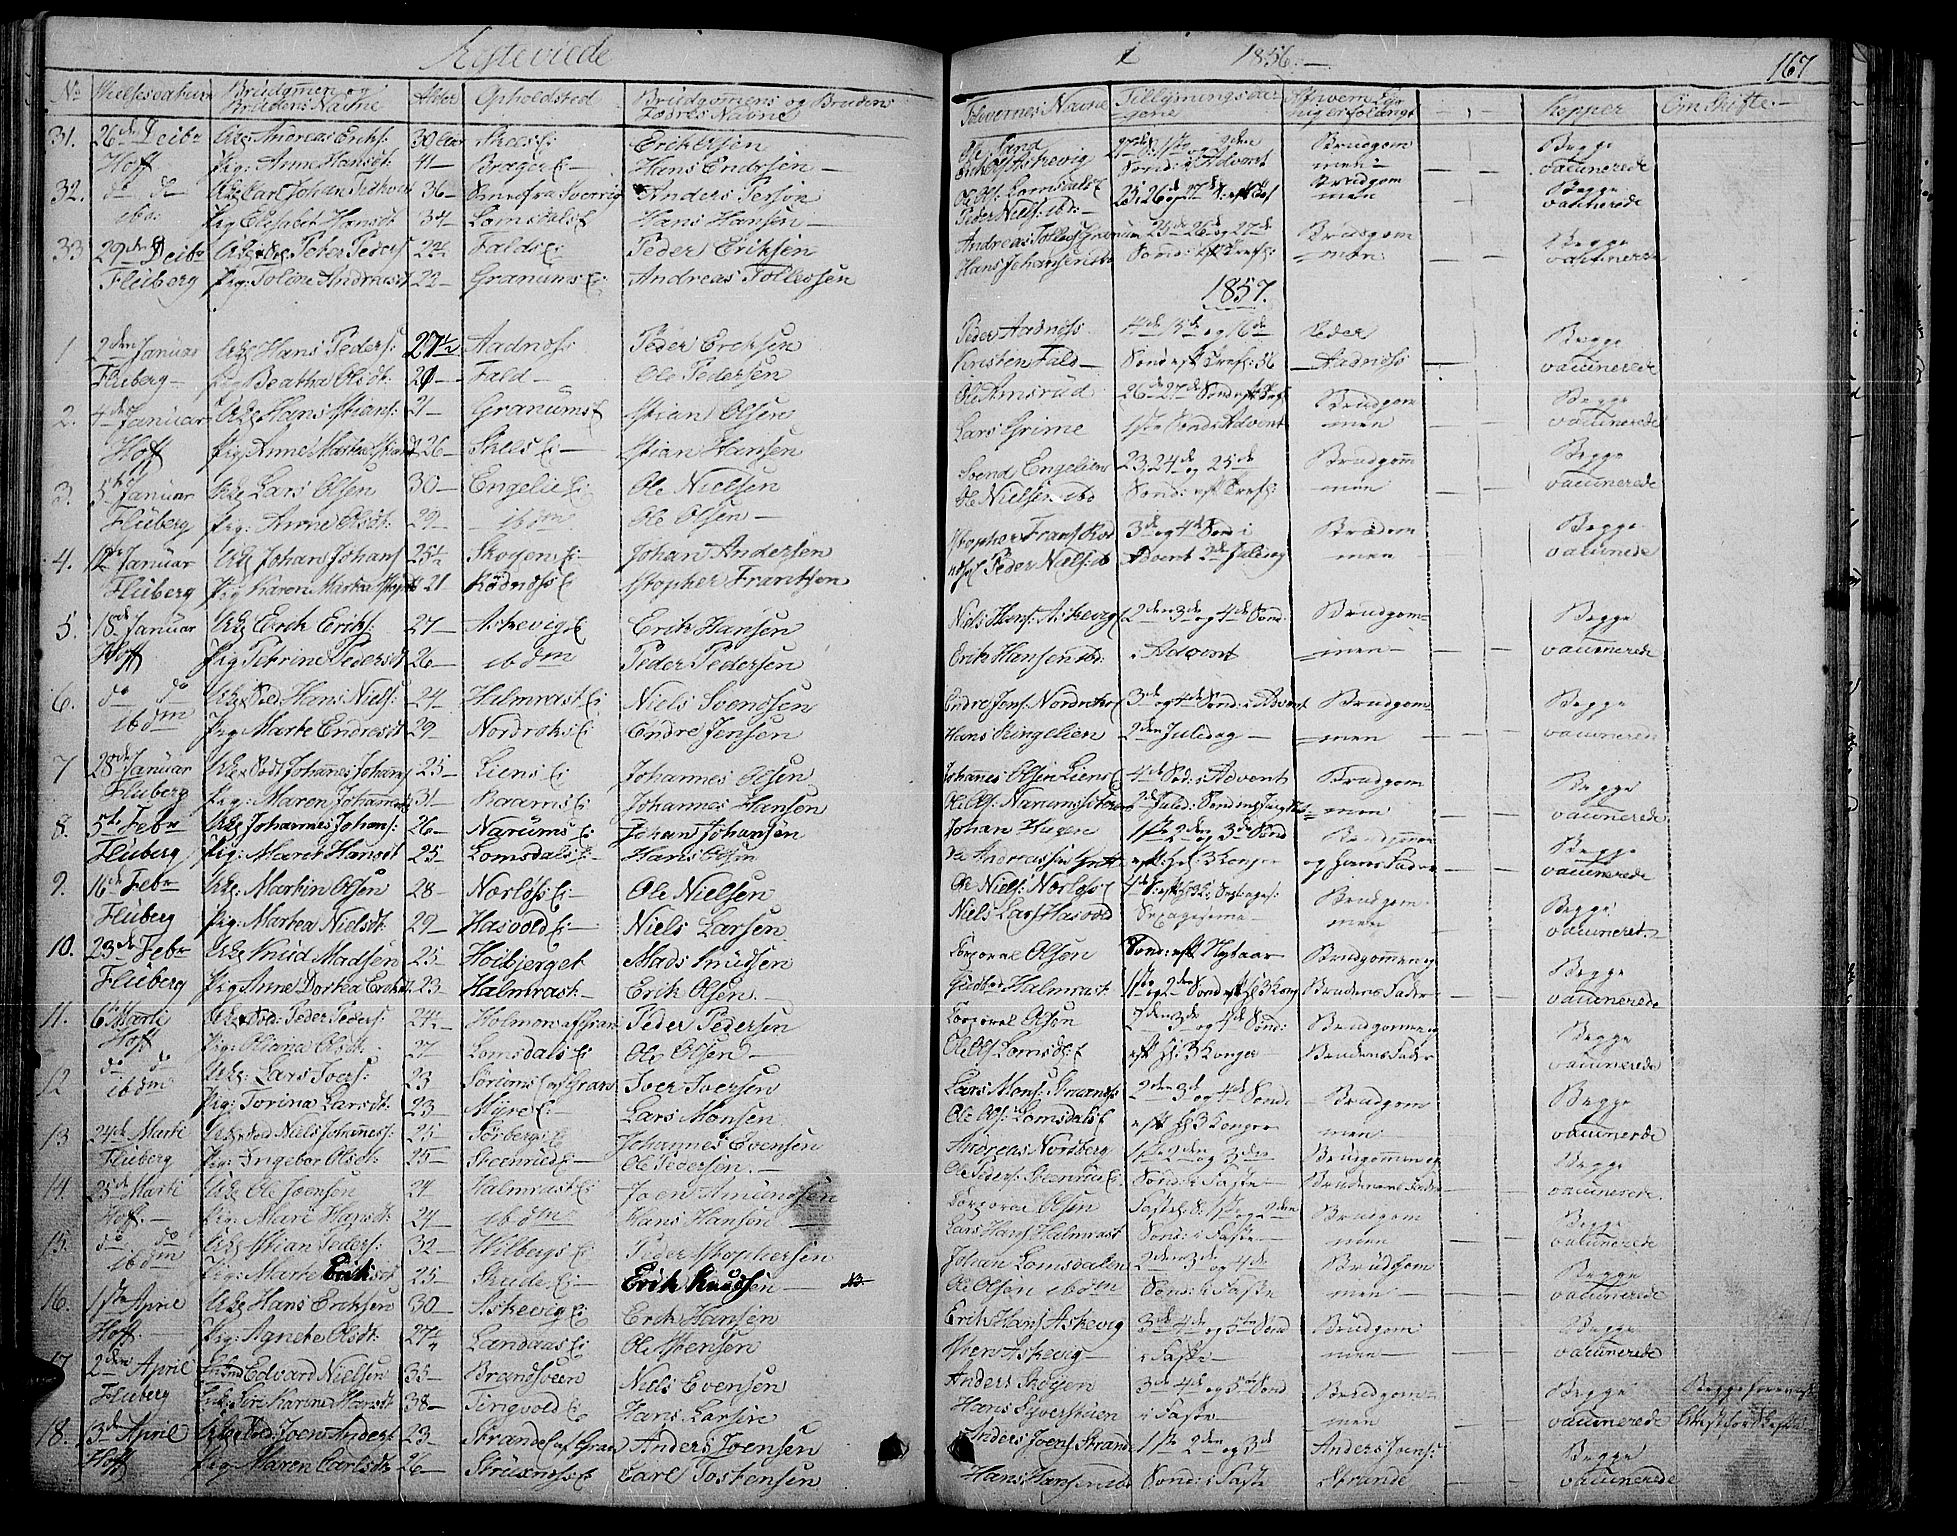 SAH, Søndre Land prestekontor, L/L0001: Klokkerbok nr. 1, 1849-1883, s. 167